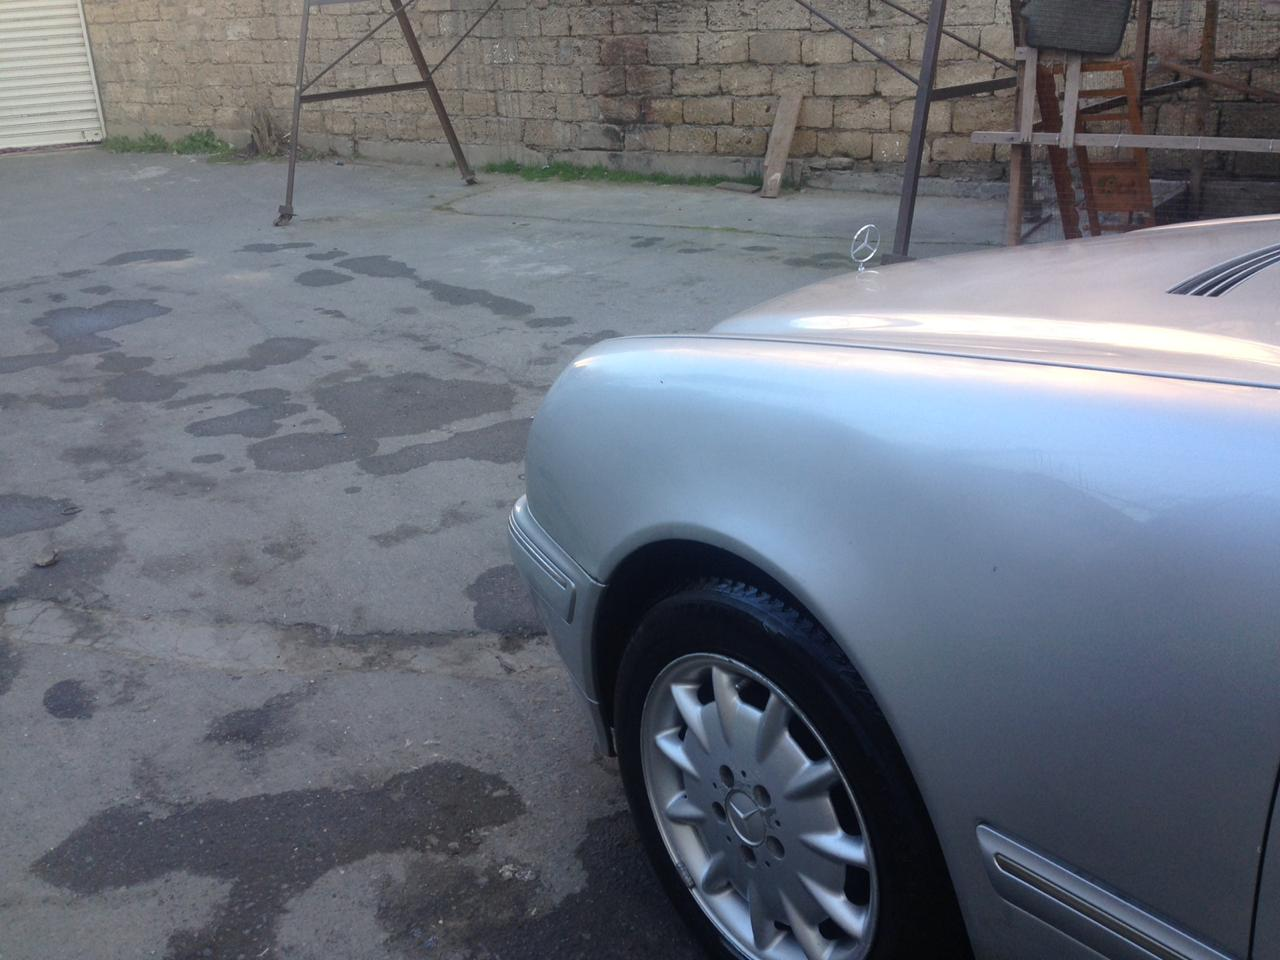 Mercedes-Benz E 220 2.2(lt) 1999 Подержанный  $7900